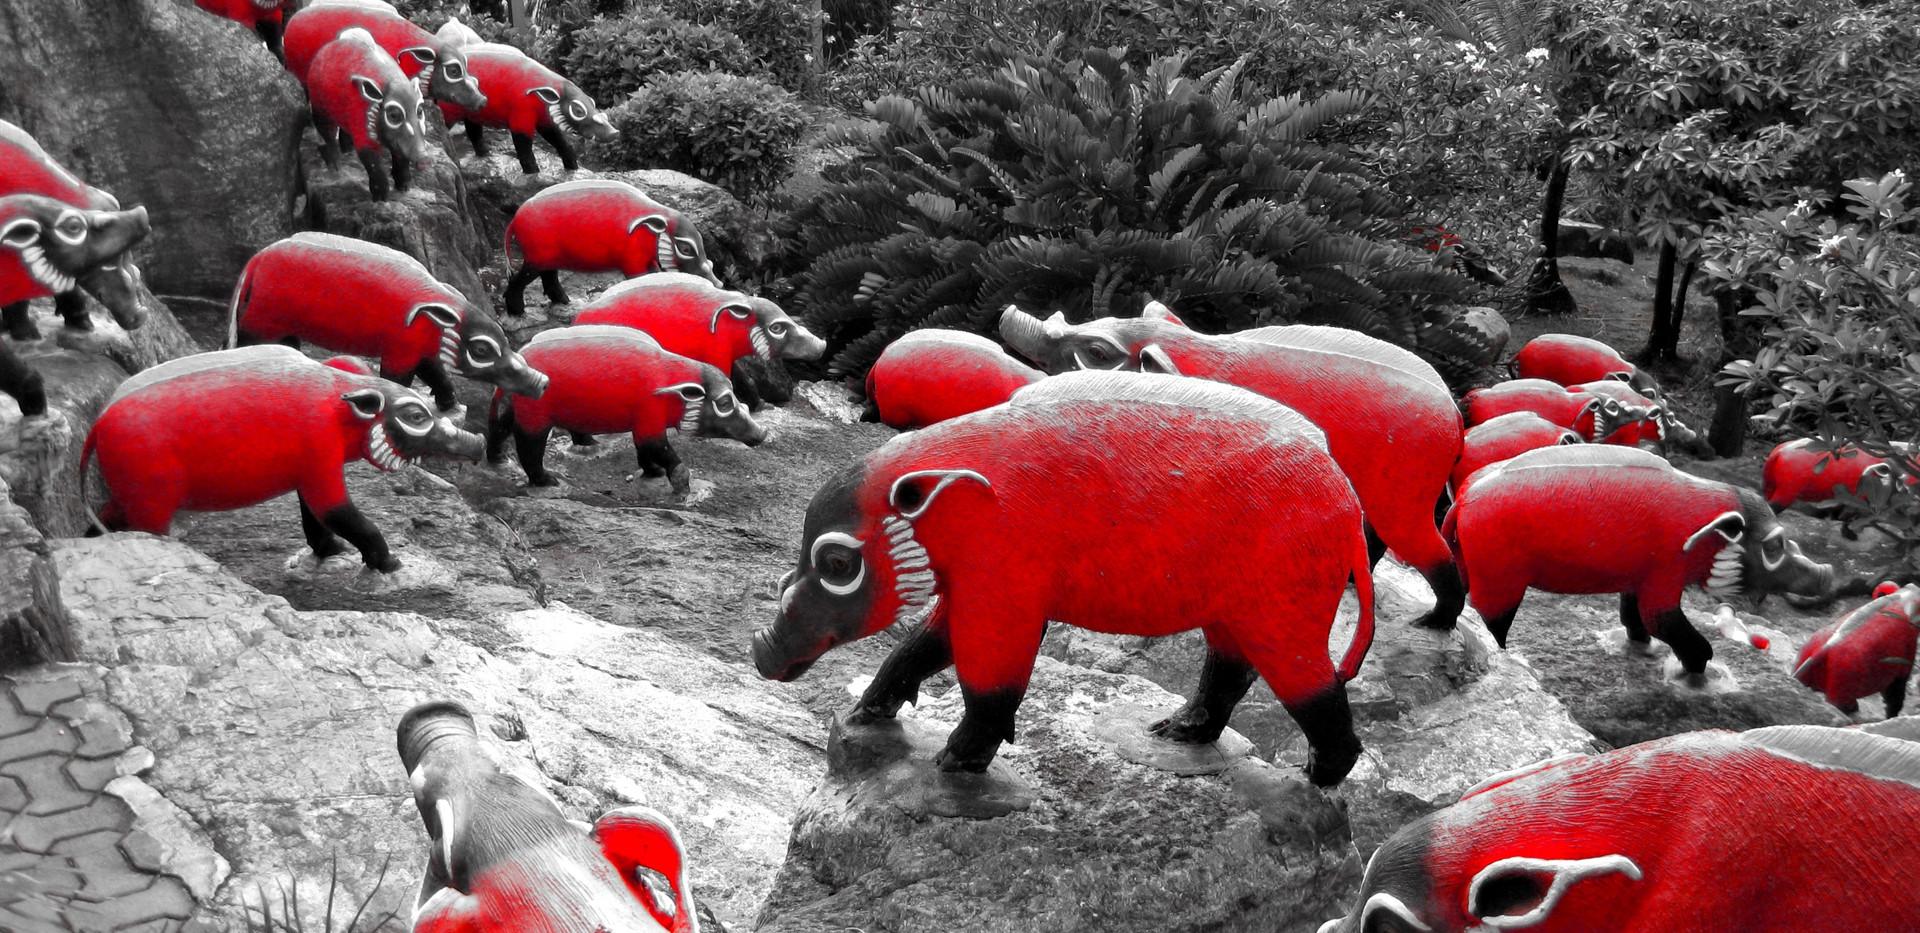 Herde in Rot